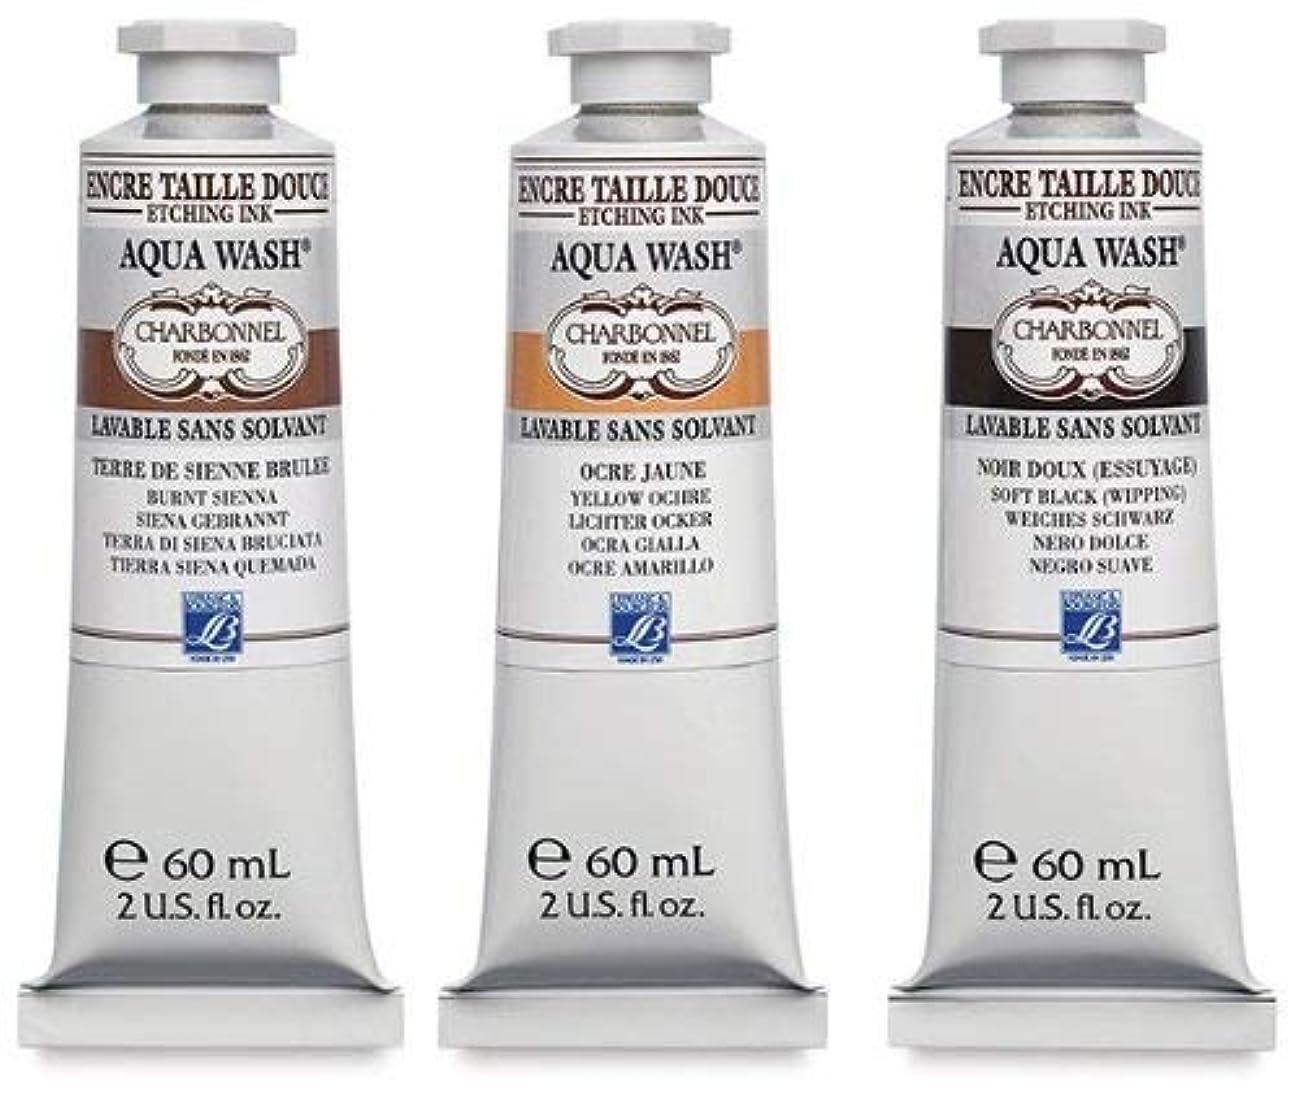 Charbonnel Aqua Wash Etching Ink - Black RSR 60ml Tube